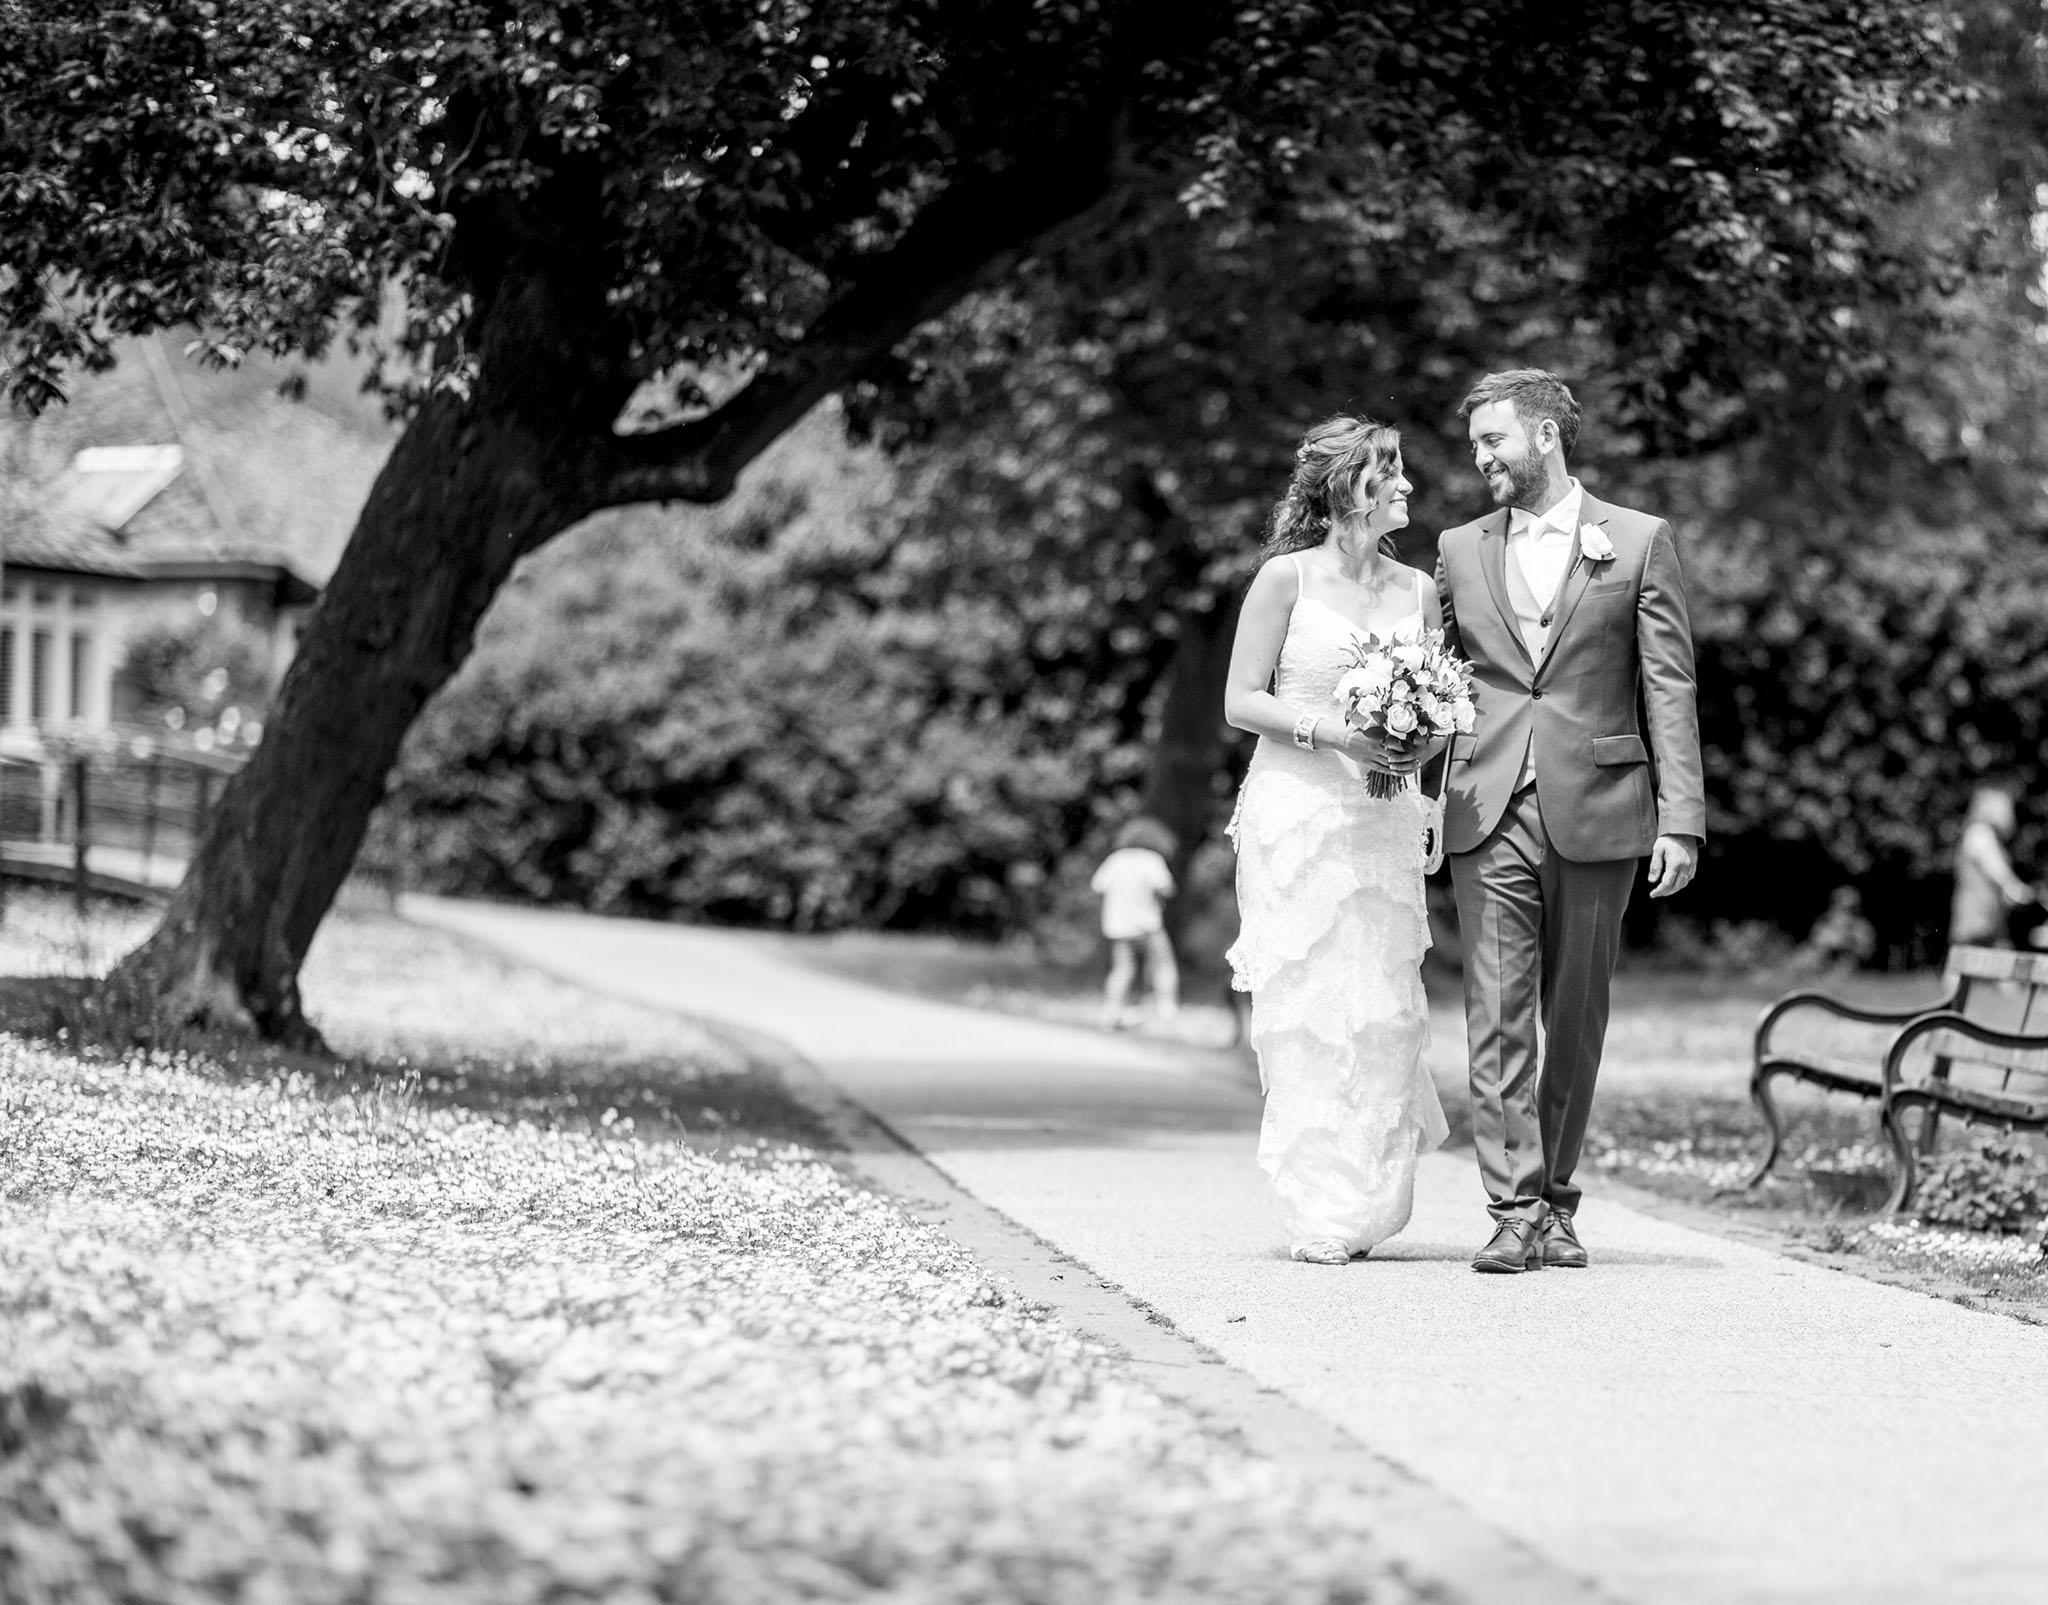 elizabethgphotography_kingslangley_hertfordshire_fineart_wedding_enfield_ricky_nicole_nahlis_35.jpg